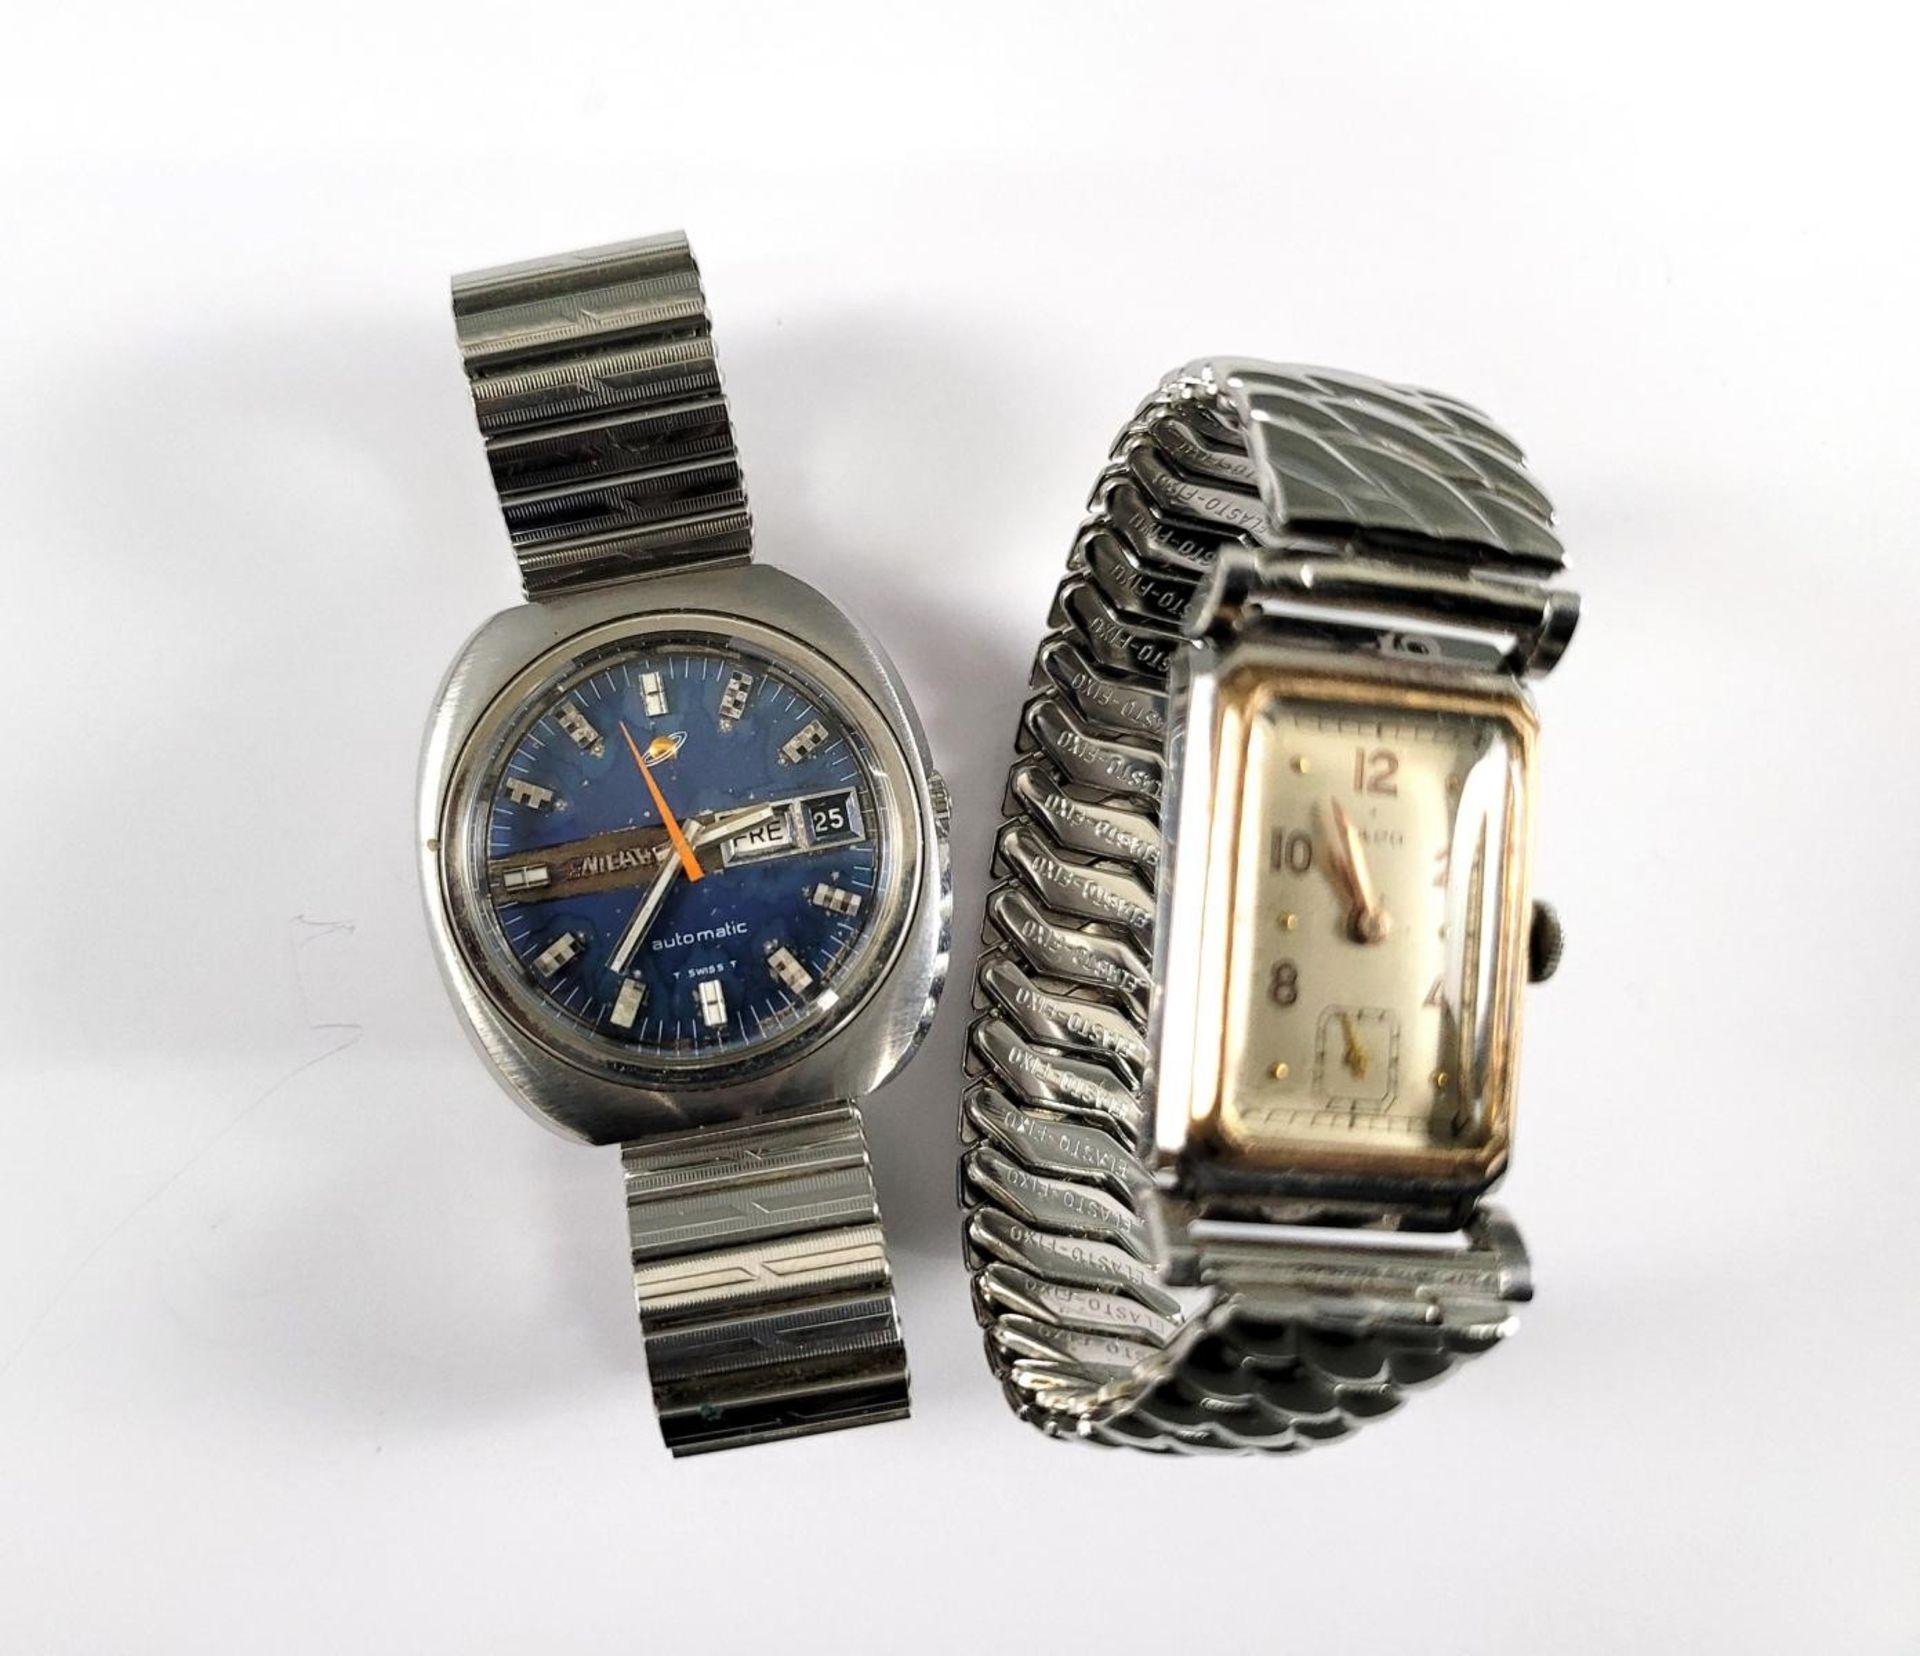 ENICAR Automatic Herrenarmbanduhr und LACO Damenarmbanduhr - Bild 2 aus 4